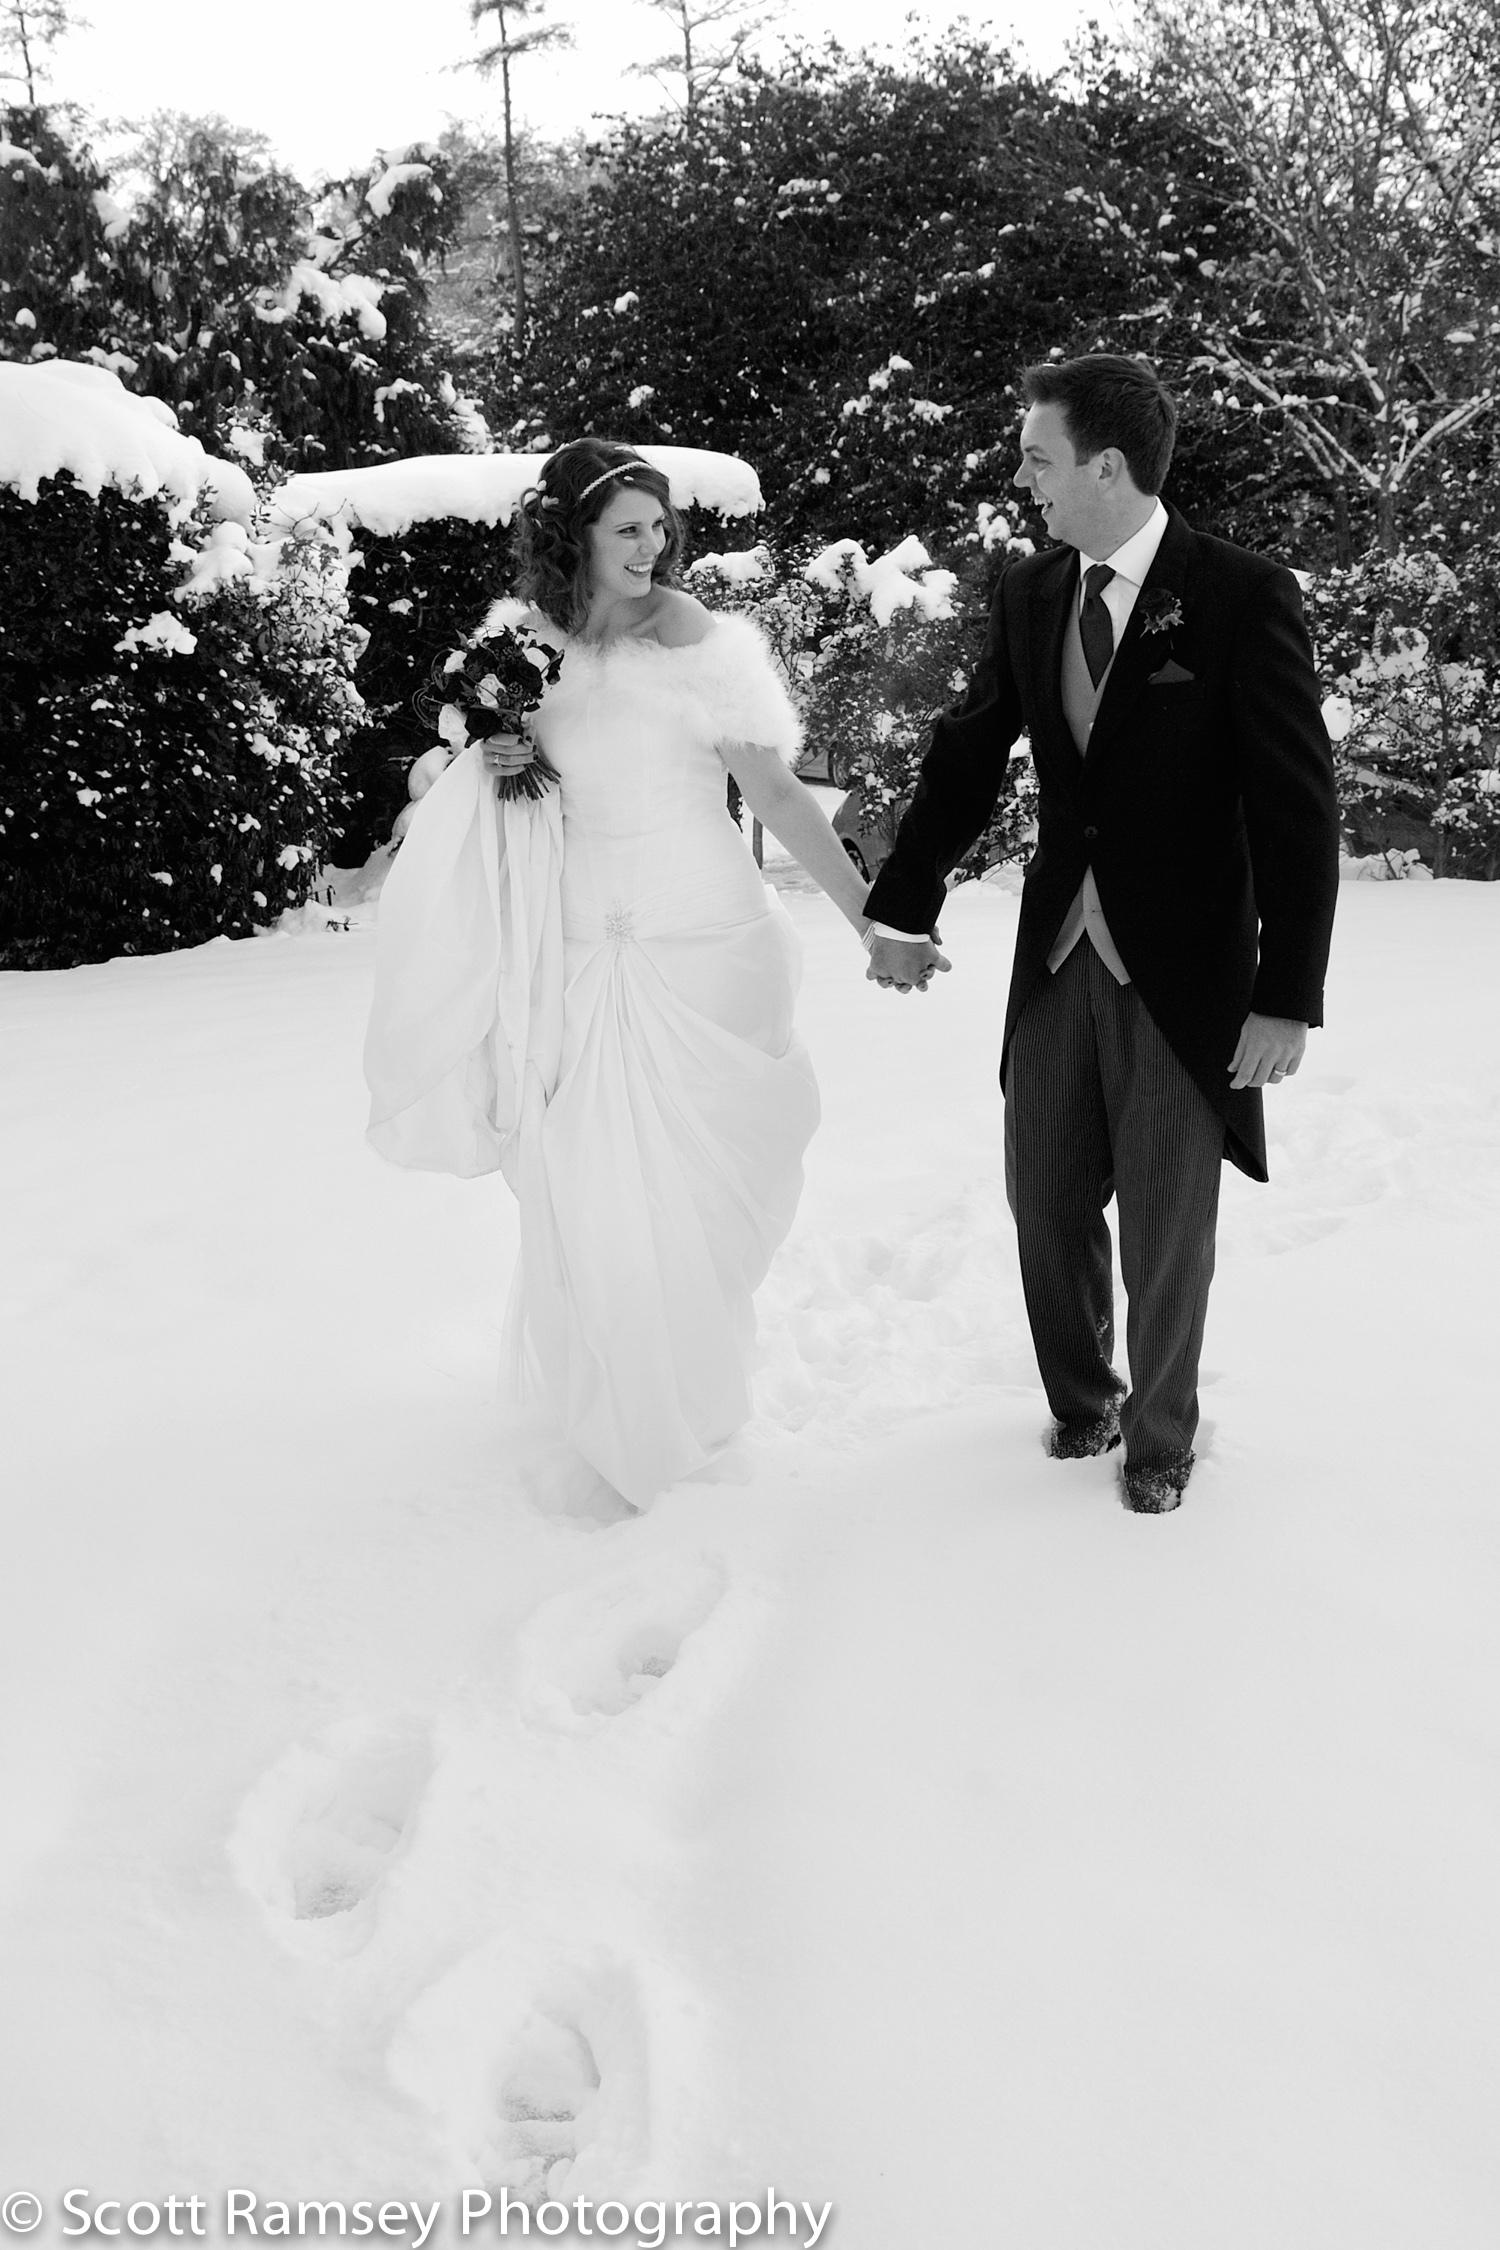 Winter-Wedding-Spread-Eagle-Hotel-Midhurst-Bride-Groom-Walk-Hold